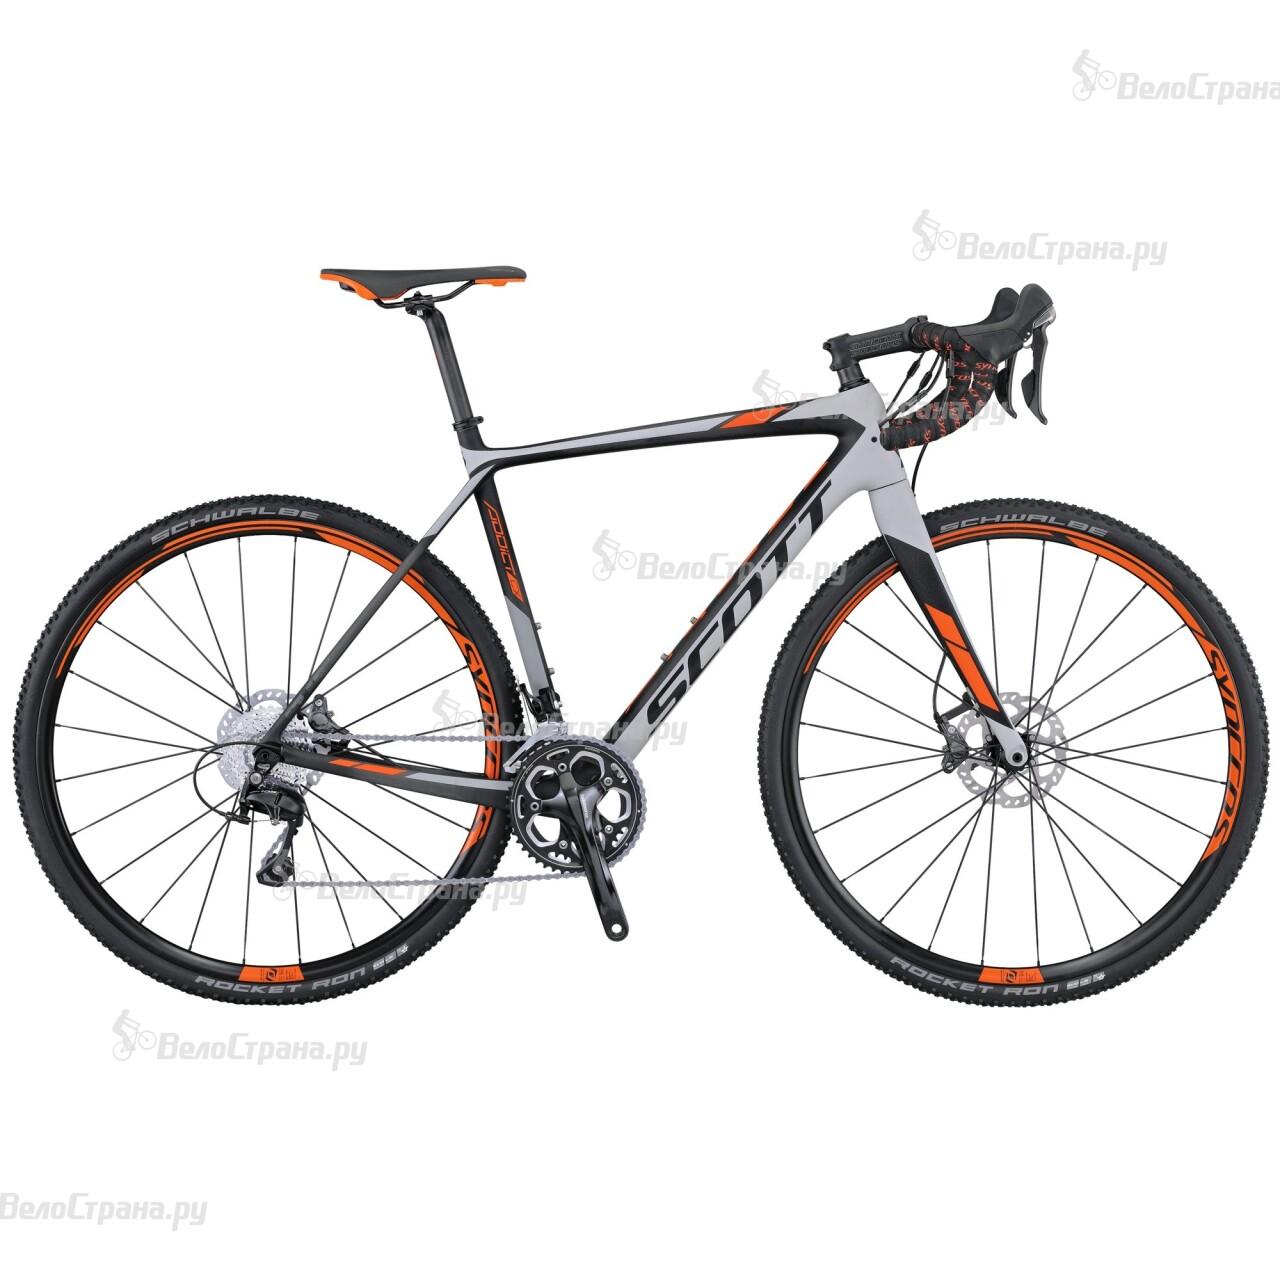 Велосипед Scott Addict CX 20 Disc (2016) scott addict sl compact 2015